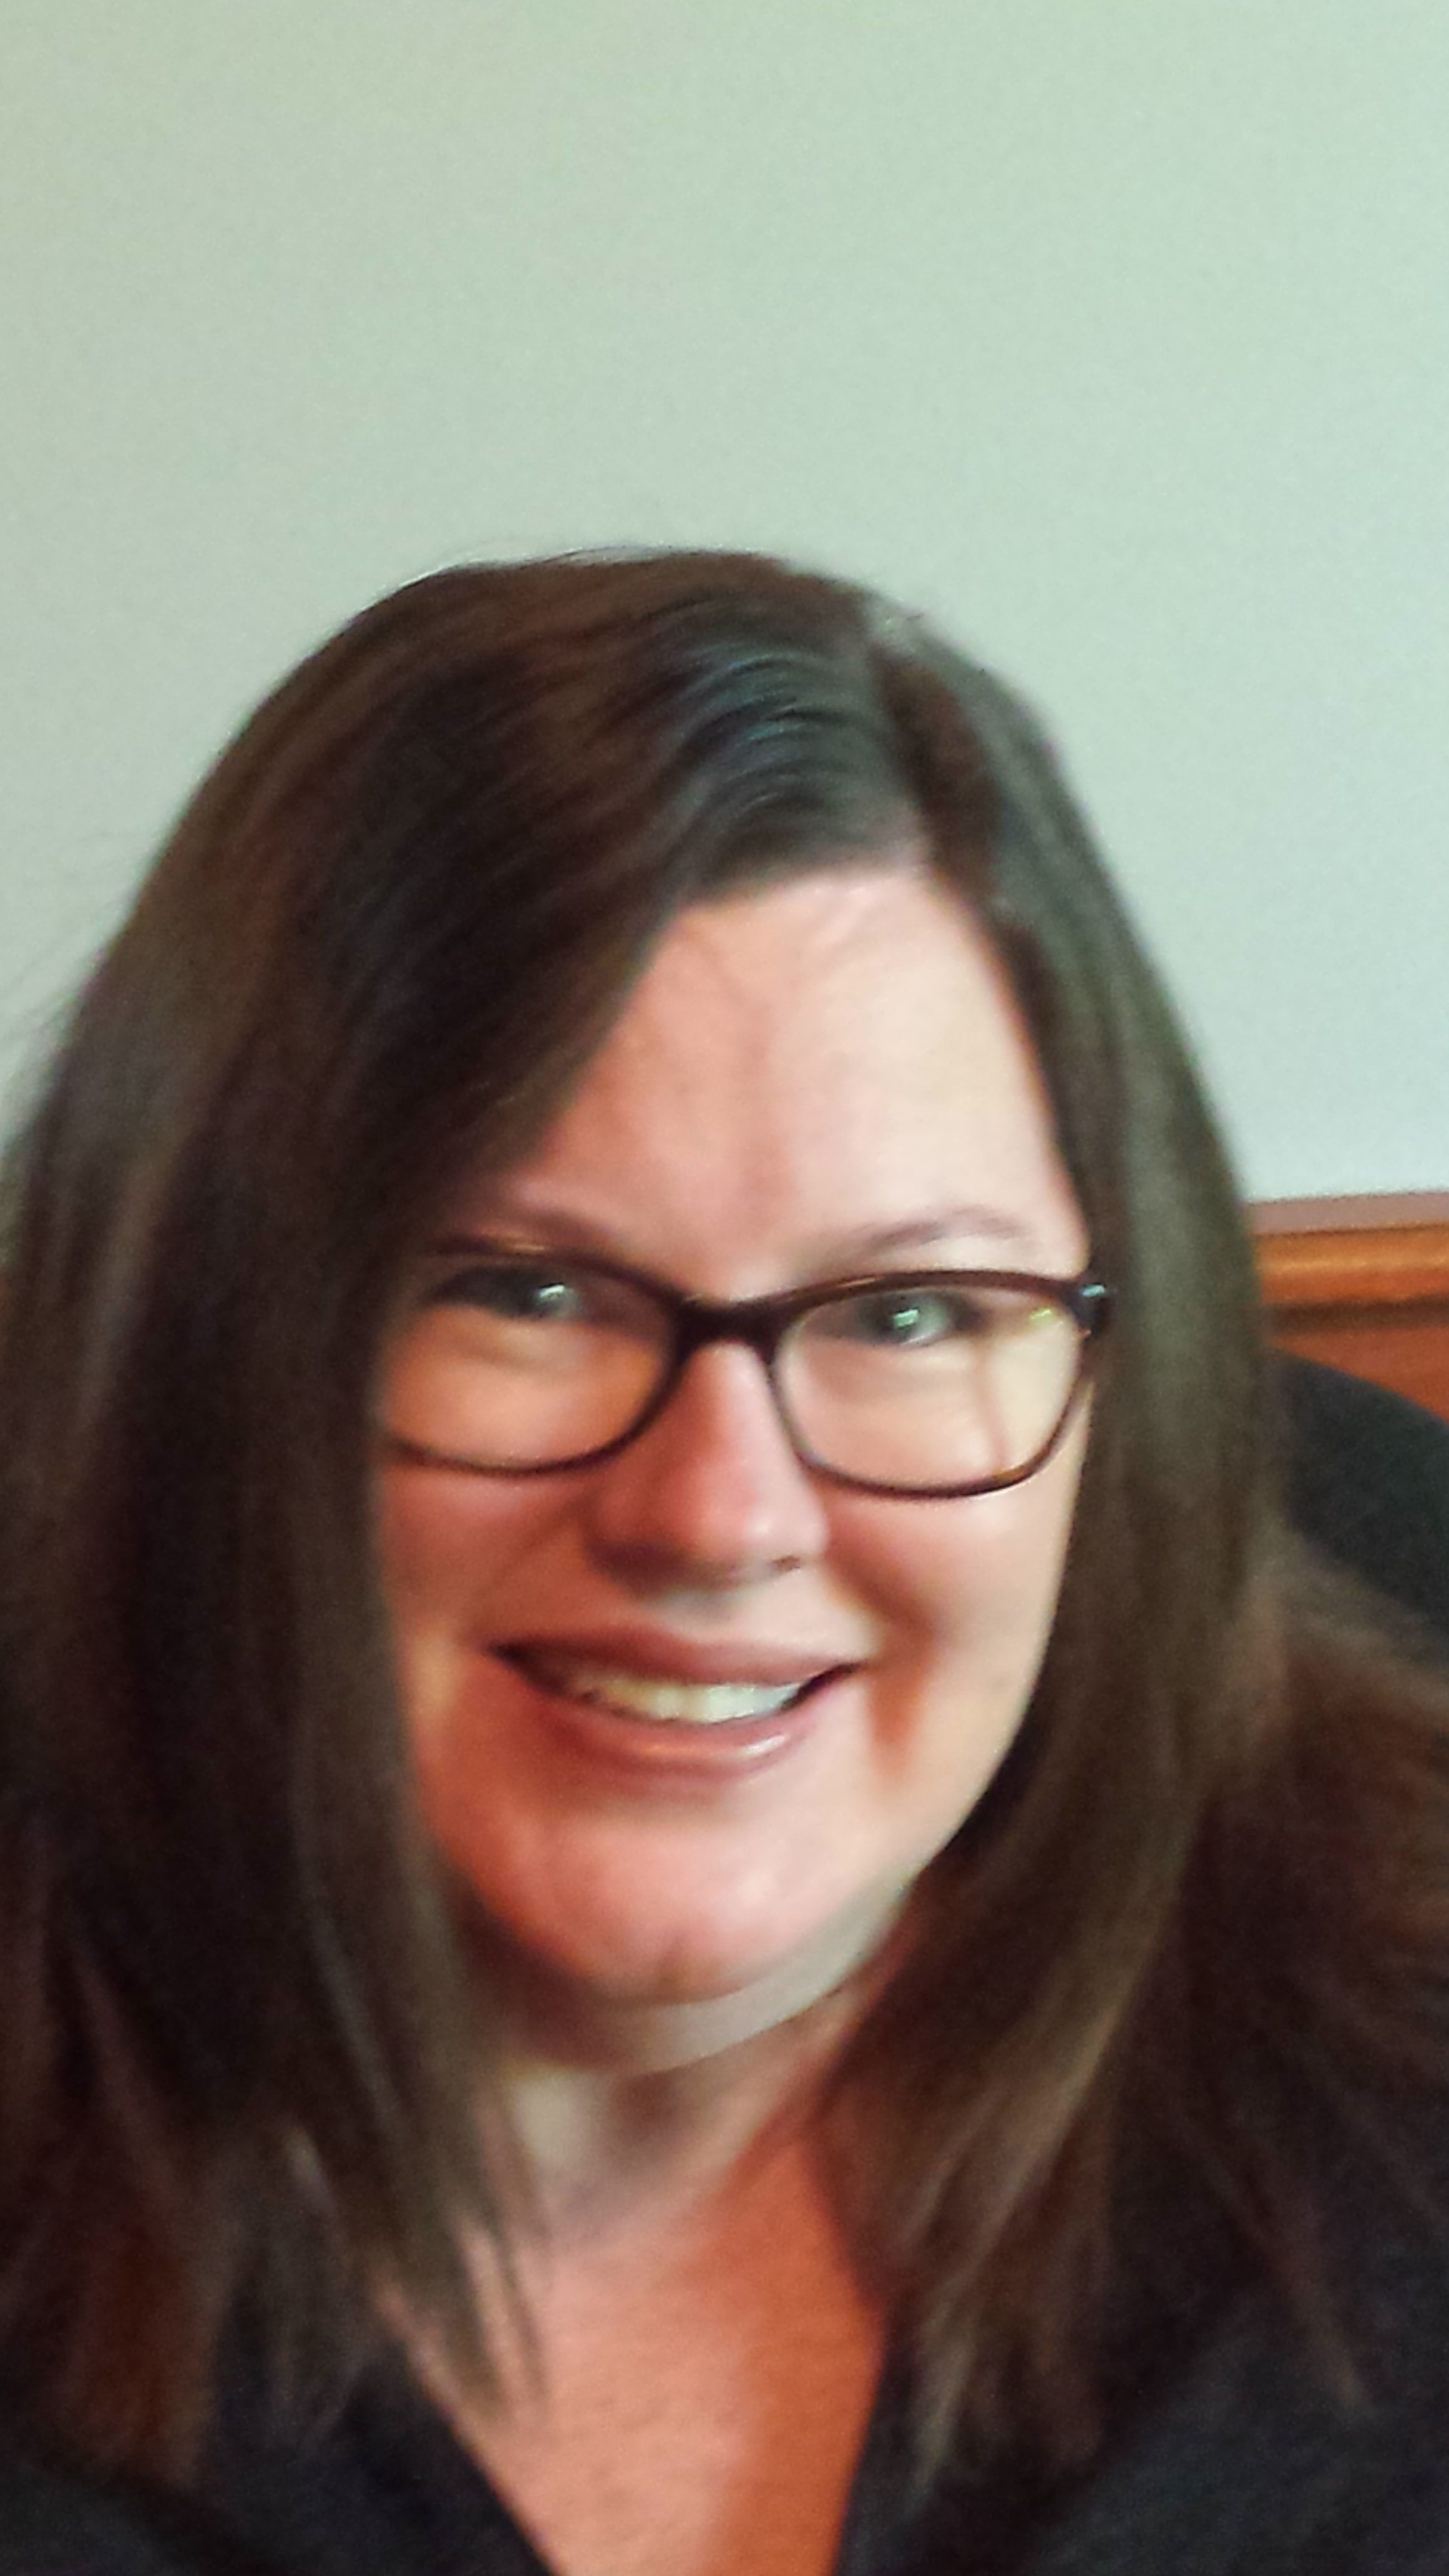 Kathy Lawlor